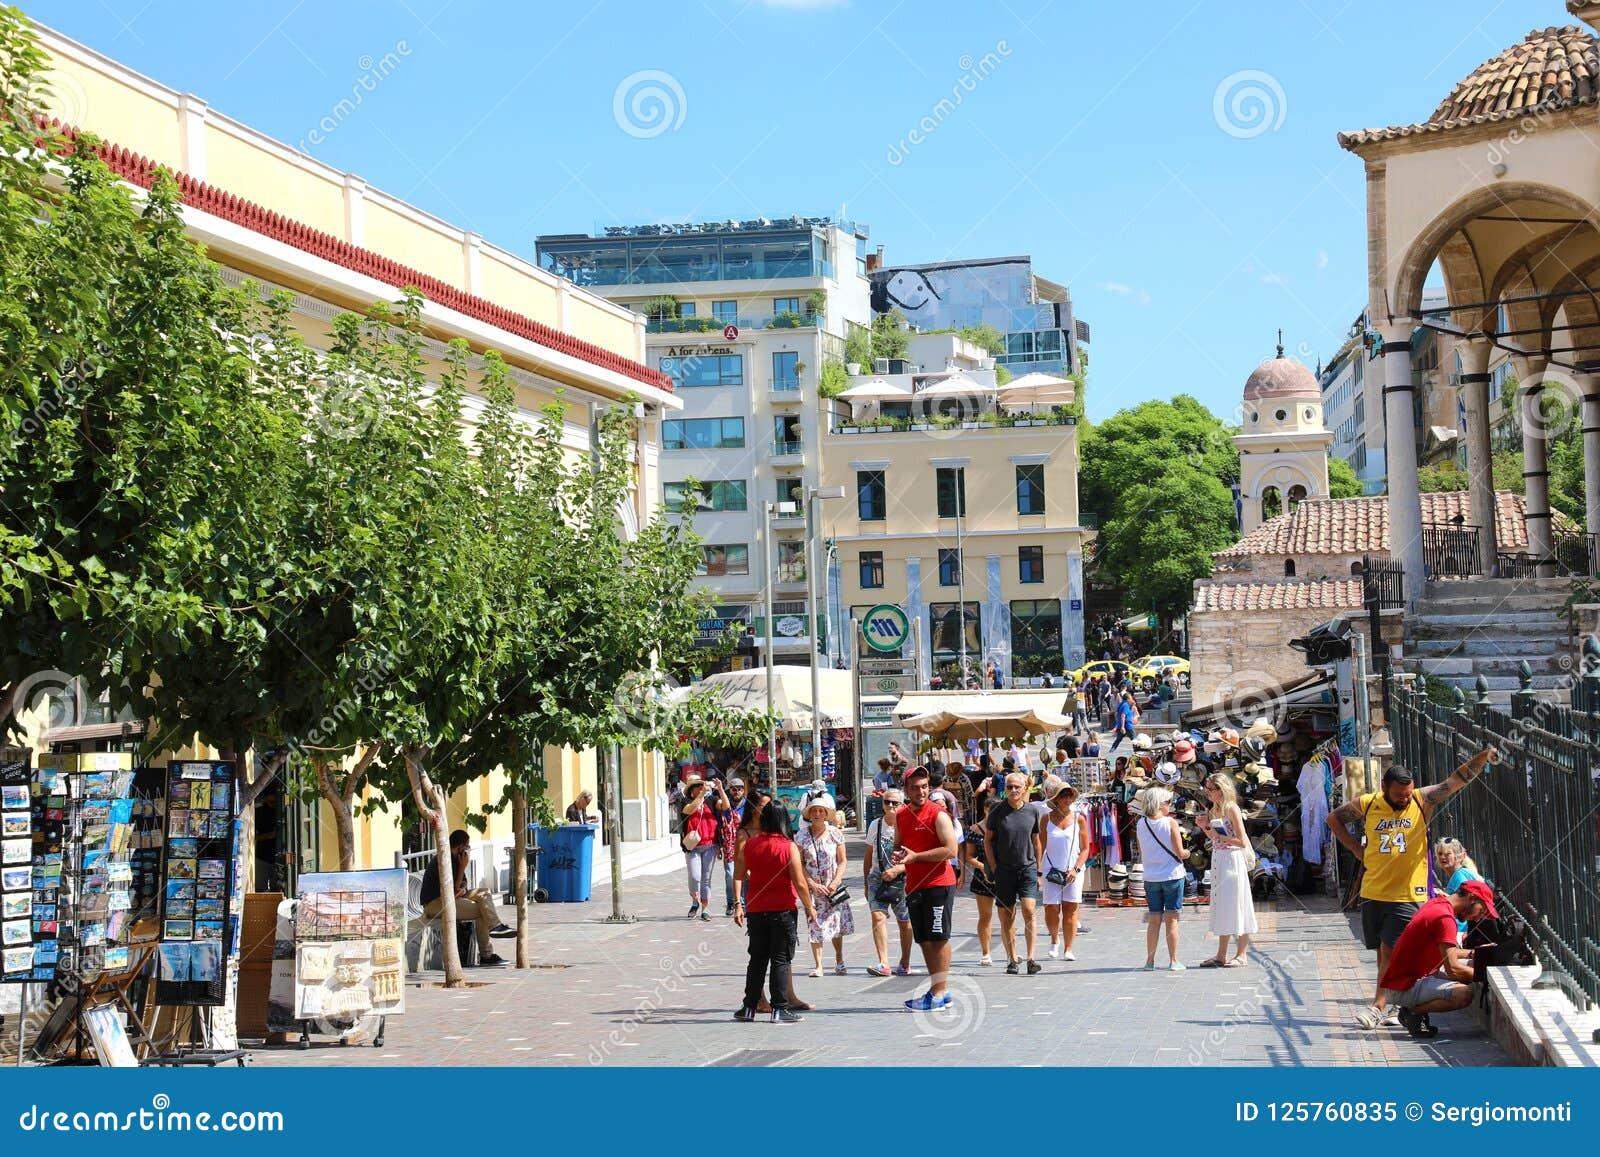 ATHENS, GREECE - JULY 18, 2018: view of Monastiraki square in At